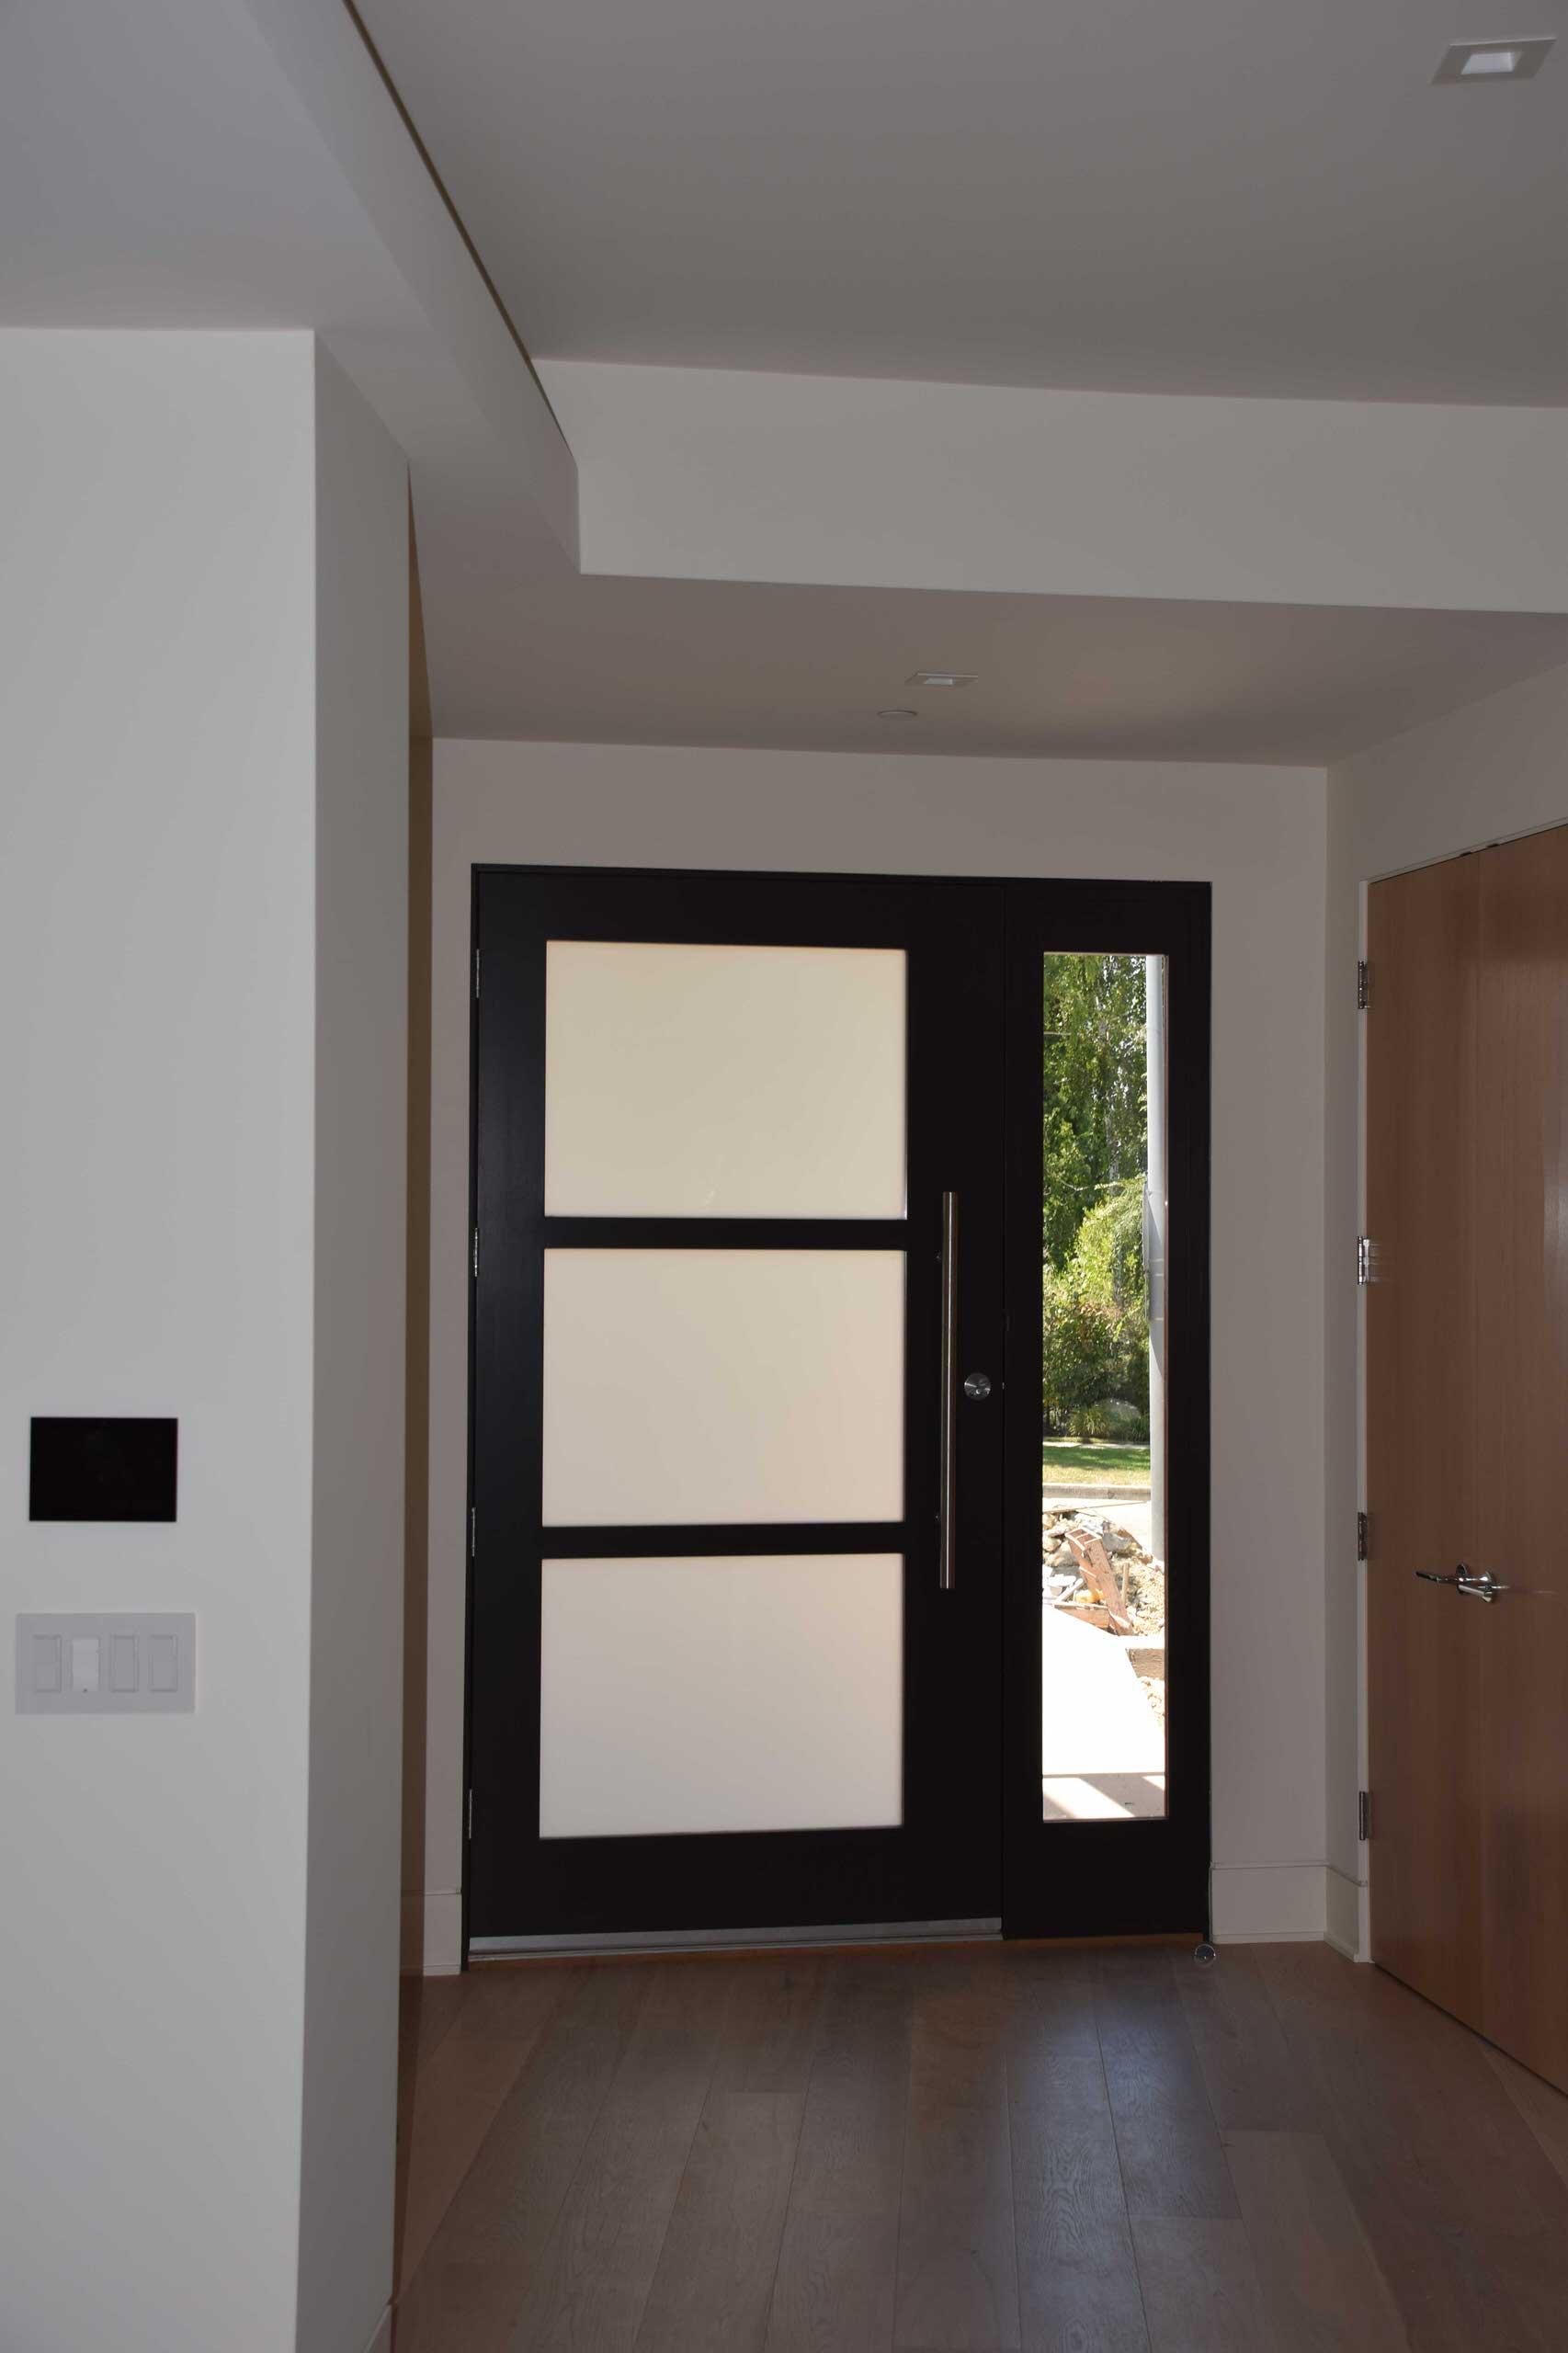 75 Beautiful Modern Front Door Pictures Ideas January 2021 Houzz